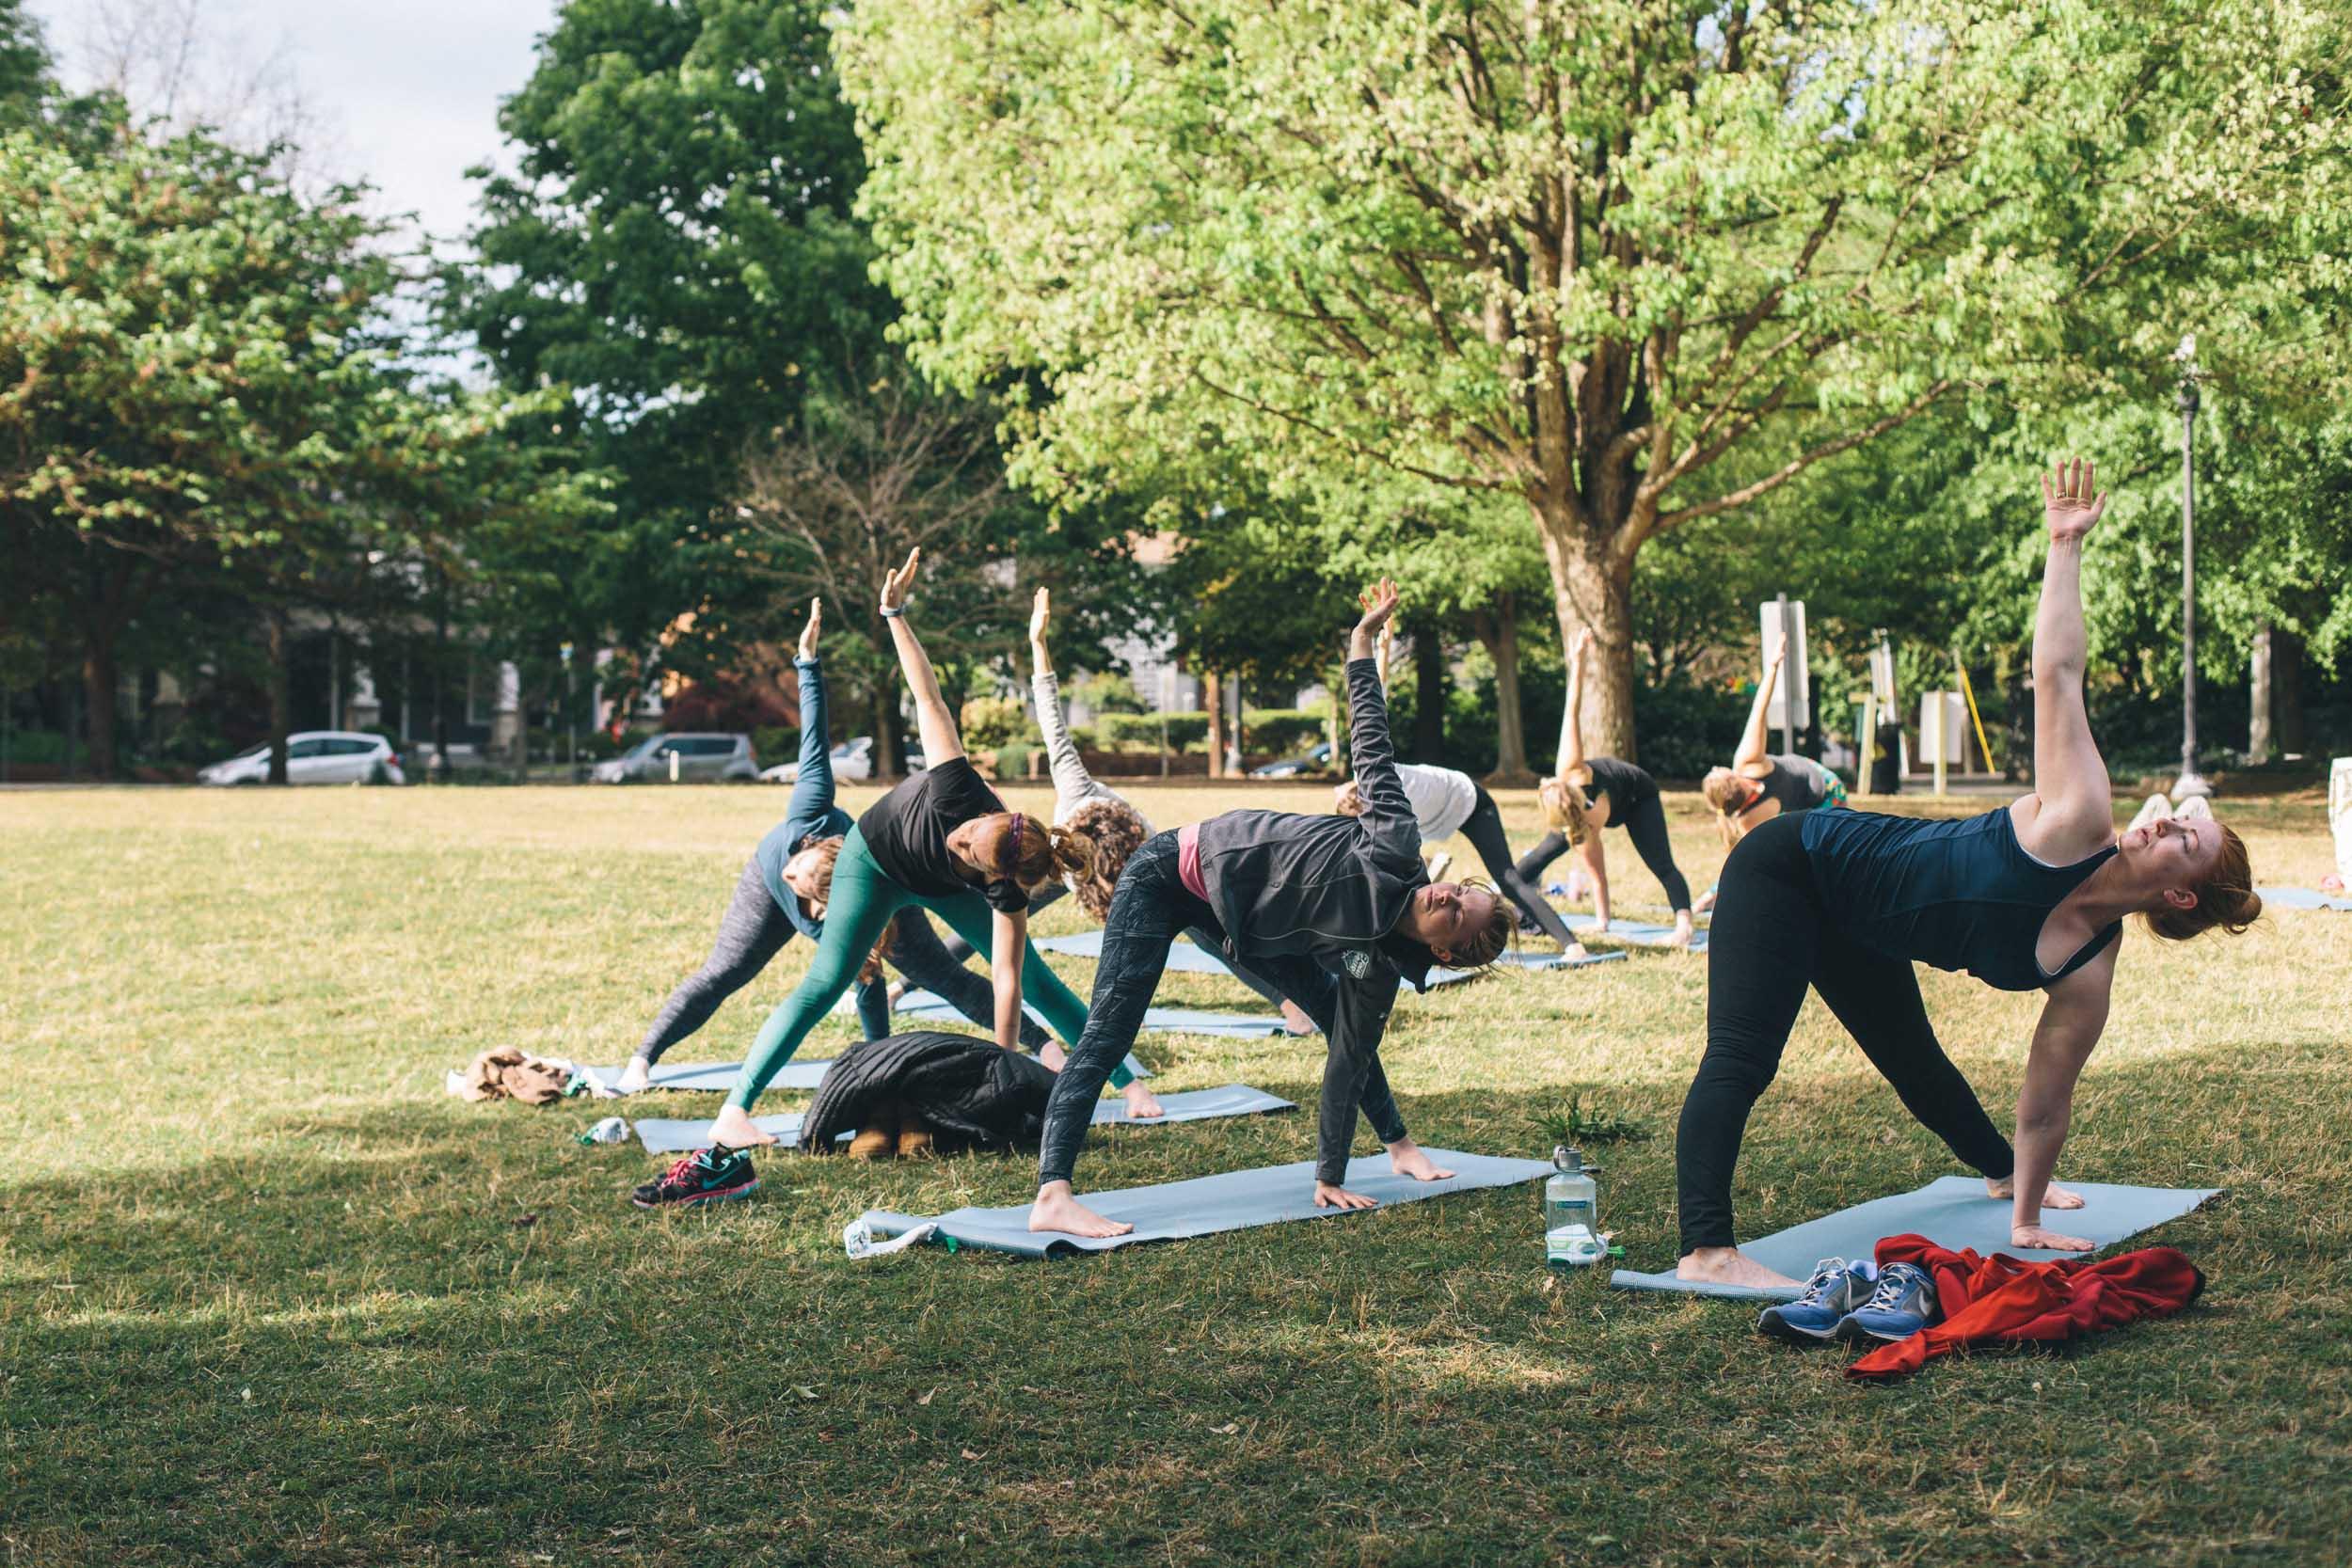 jimmy-rowalt-atlanta-event-photography-yoga-033.jpg